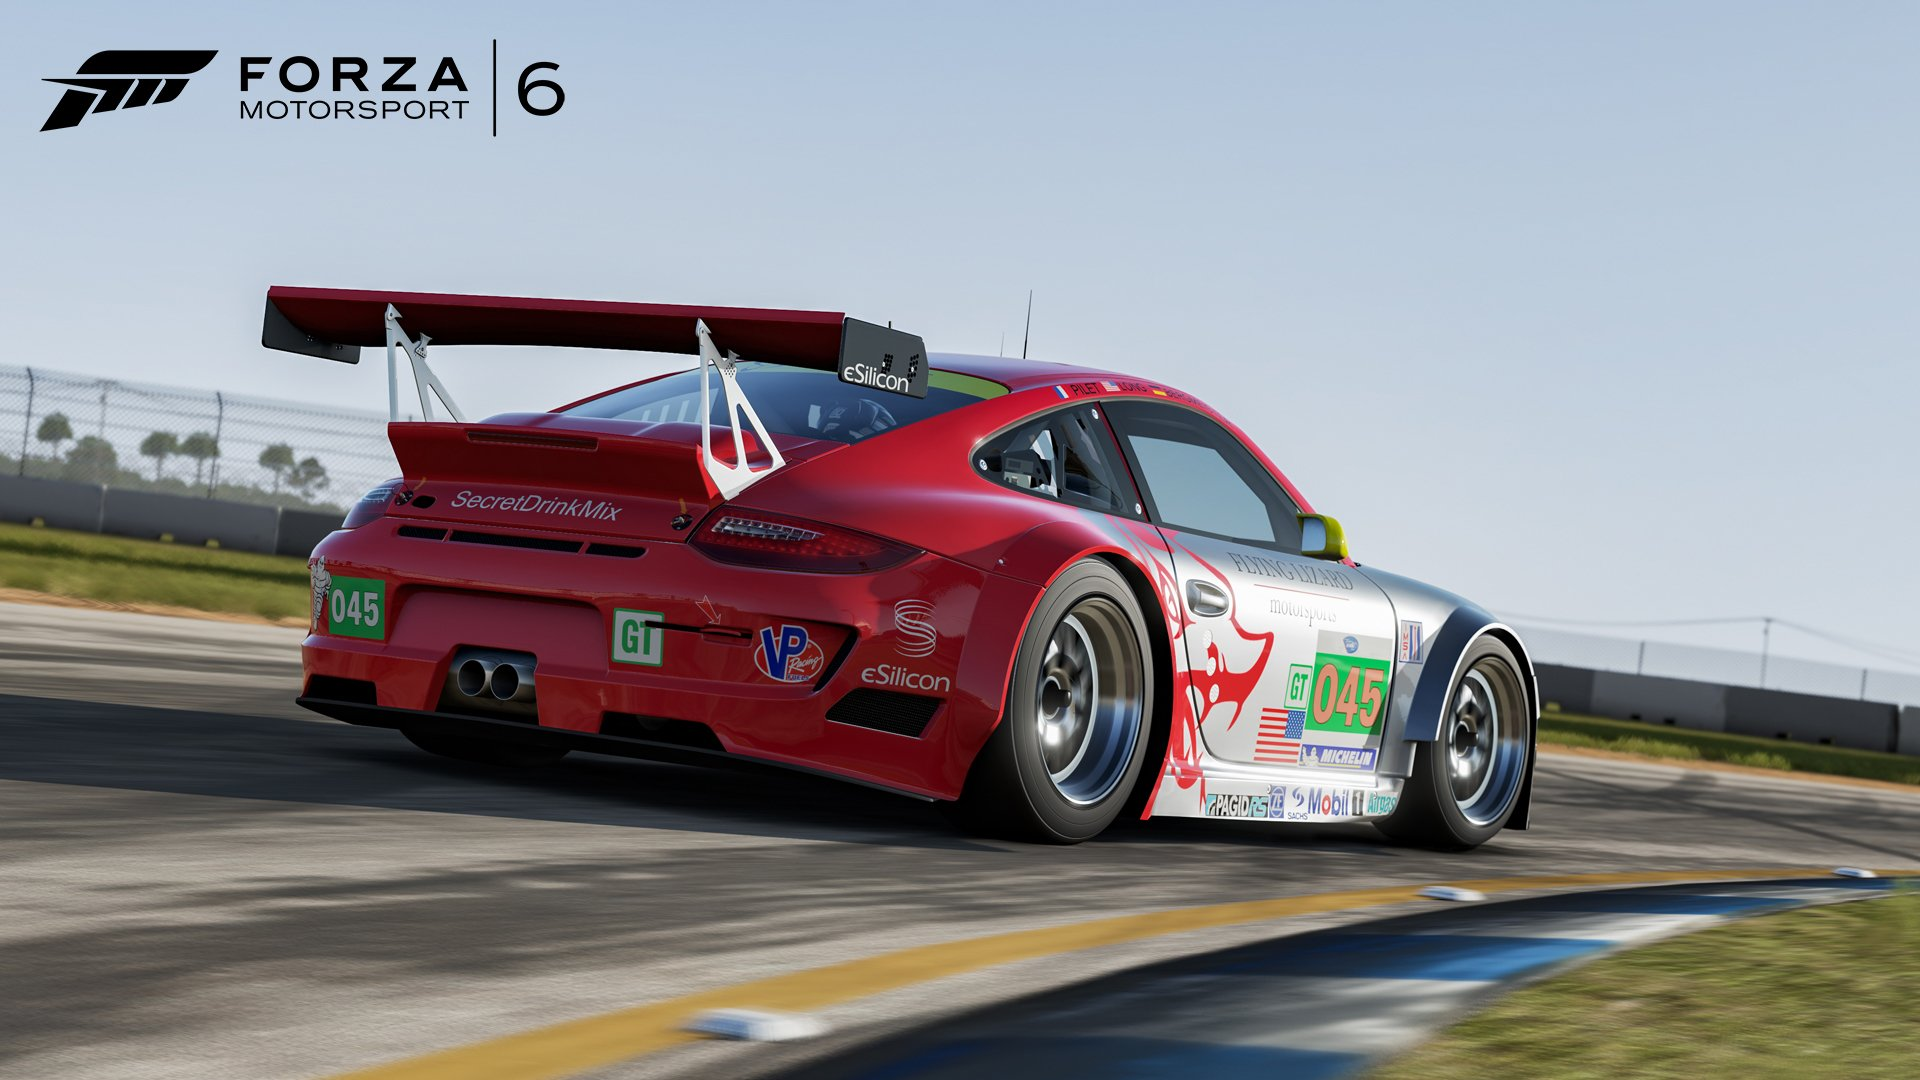 108 Forza Motorsport 6 HD Wallpapers